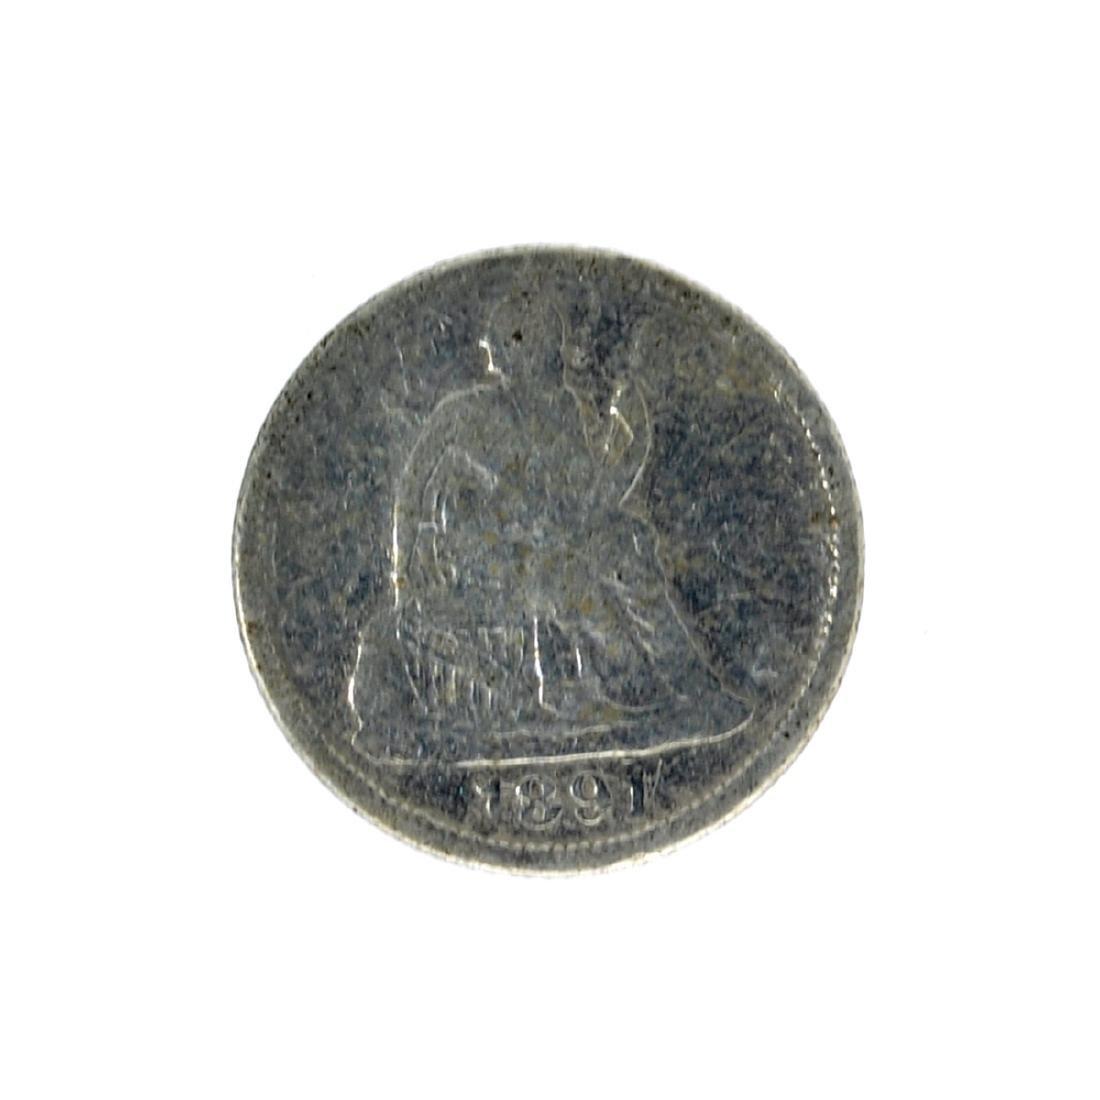 1891-O Liberty Seated Dime Coin